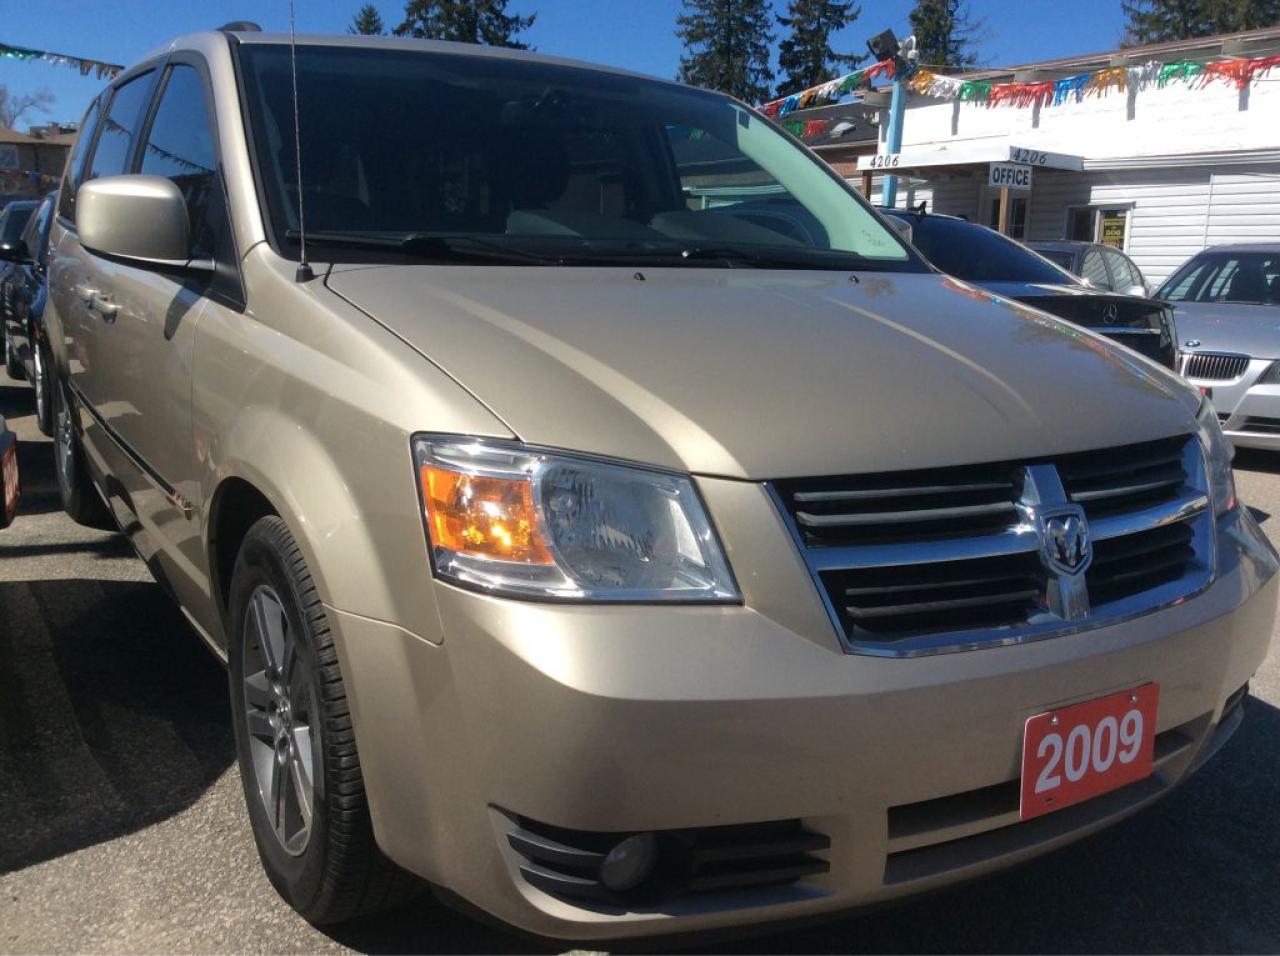 2009 Dodge Grand Caravan 4.0L Back-Up Cam Power S. Doors & Lift Gate MINT